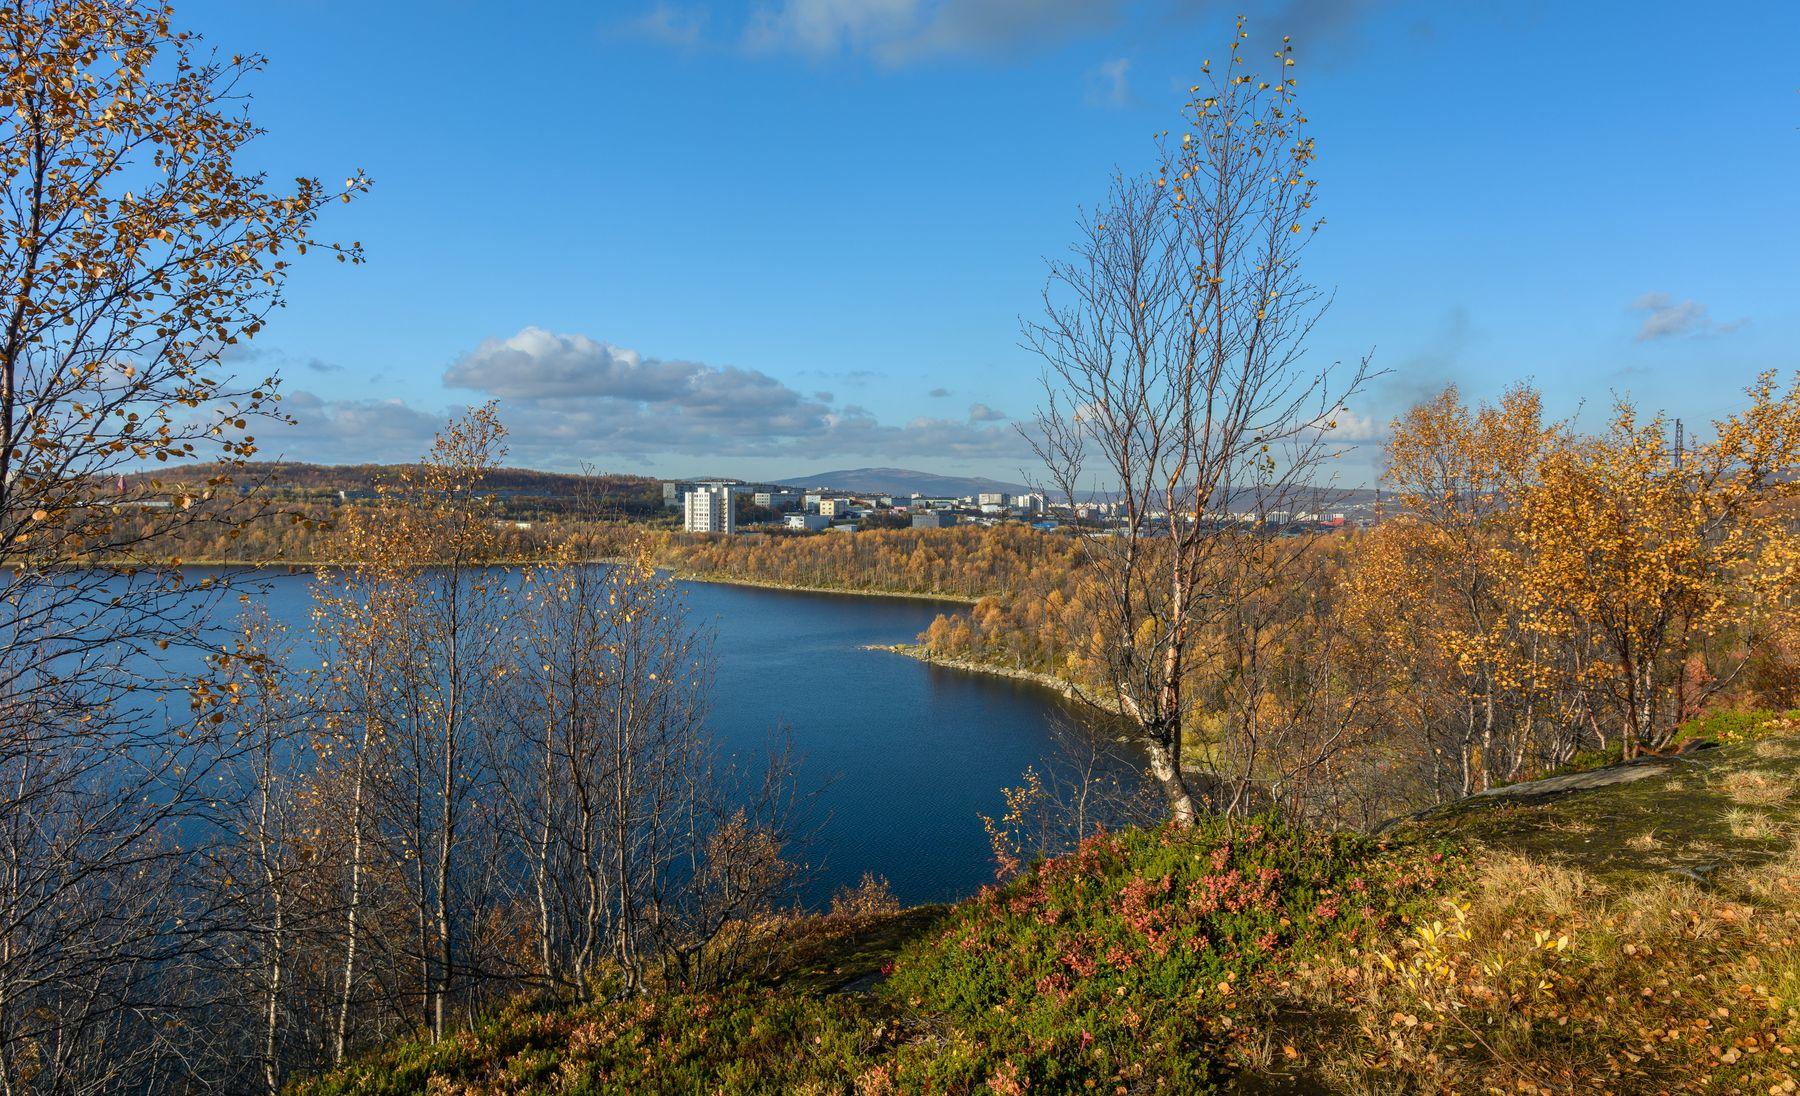 конец сентября, Мурманск осень Мурманск озеро берег